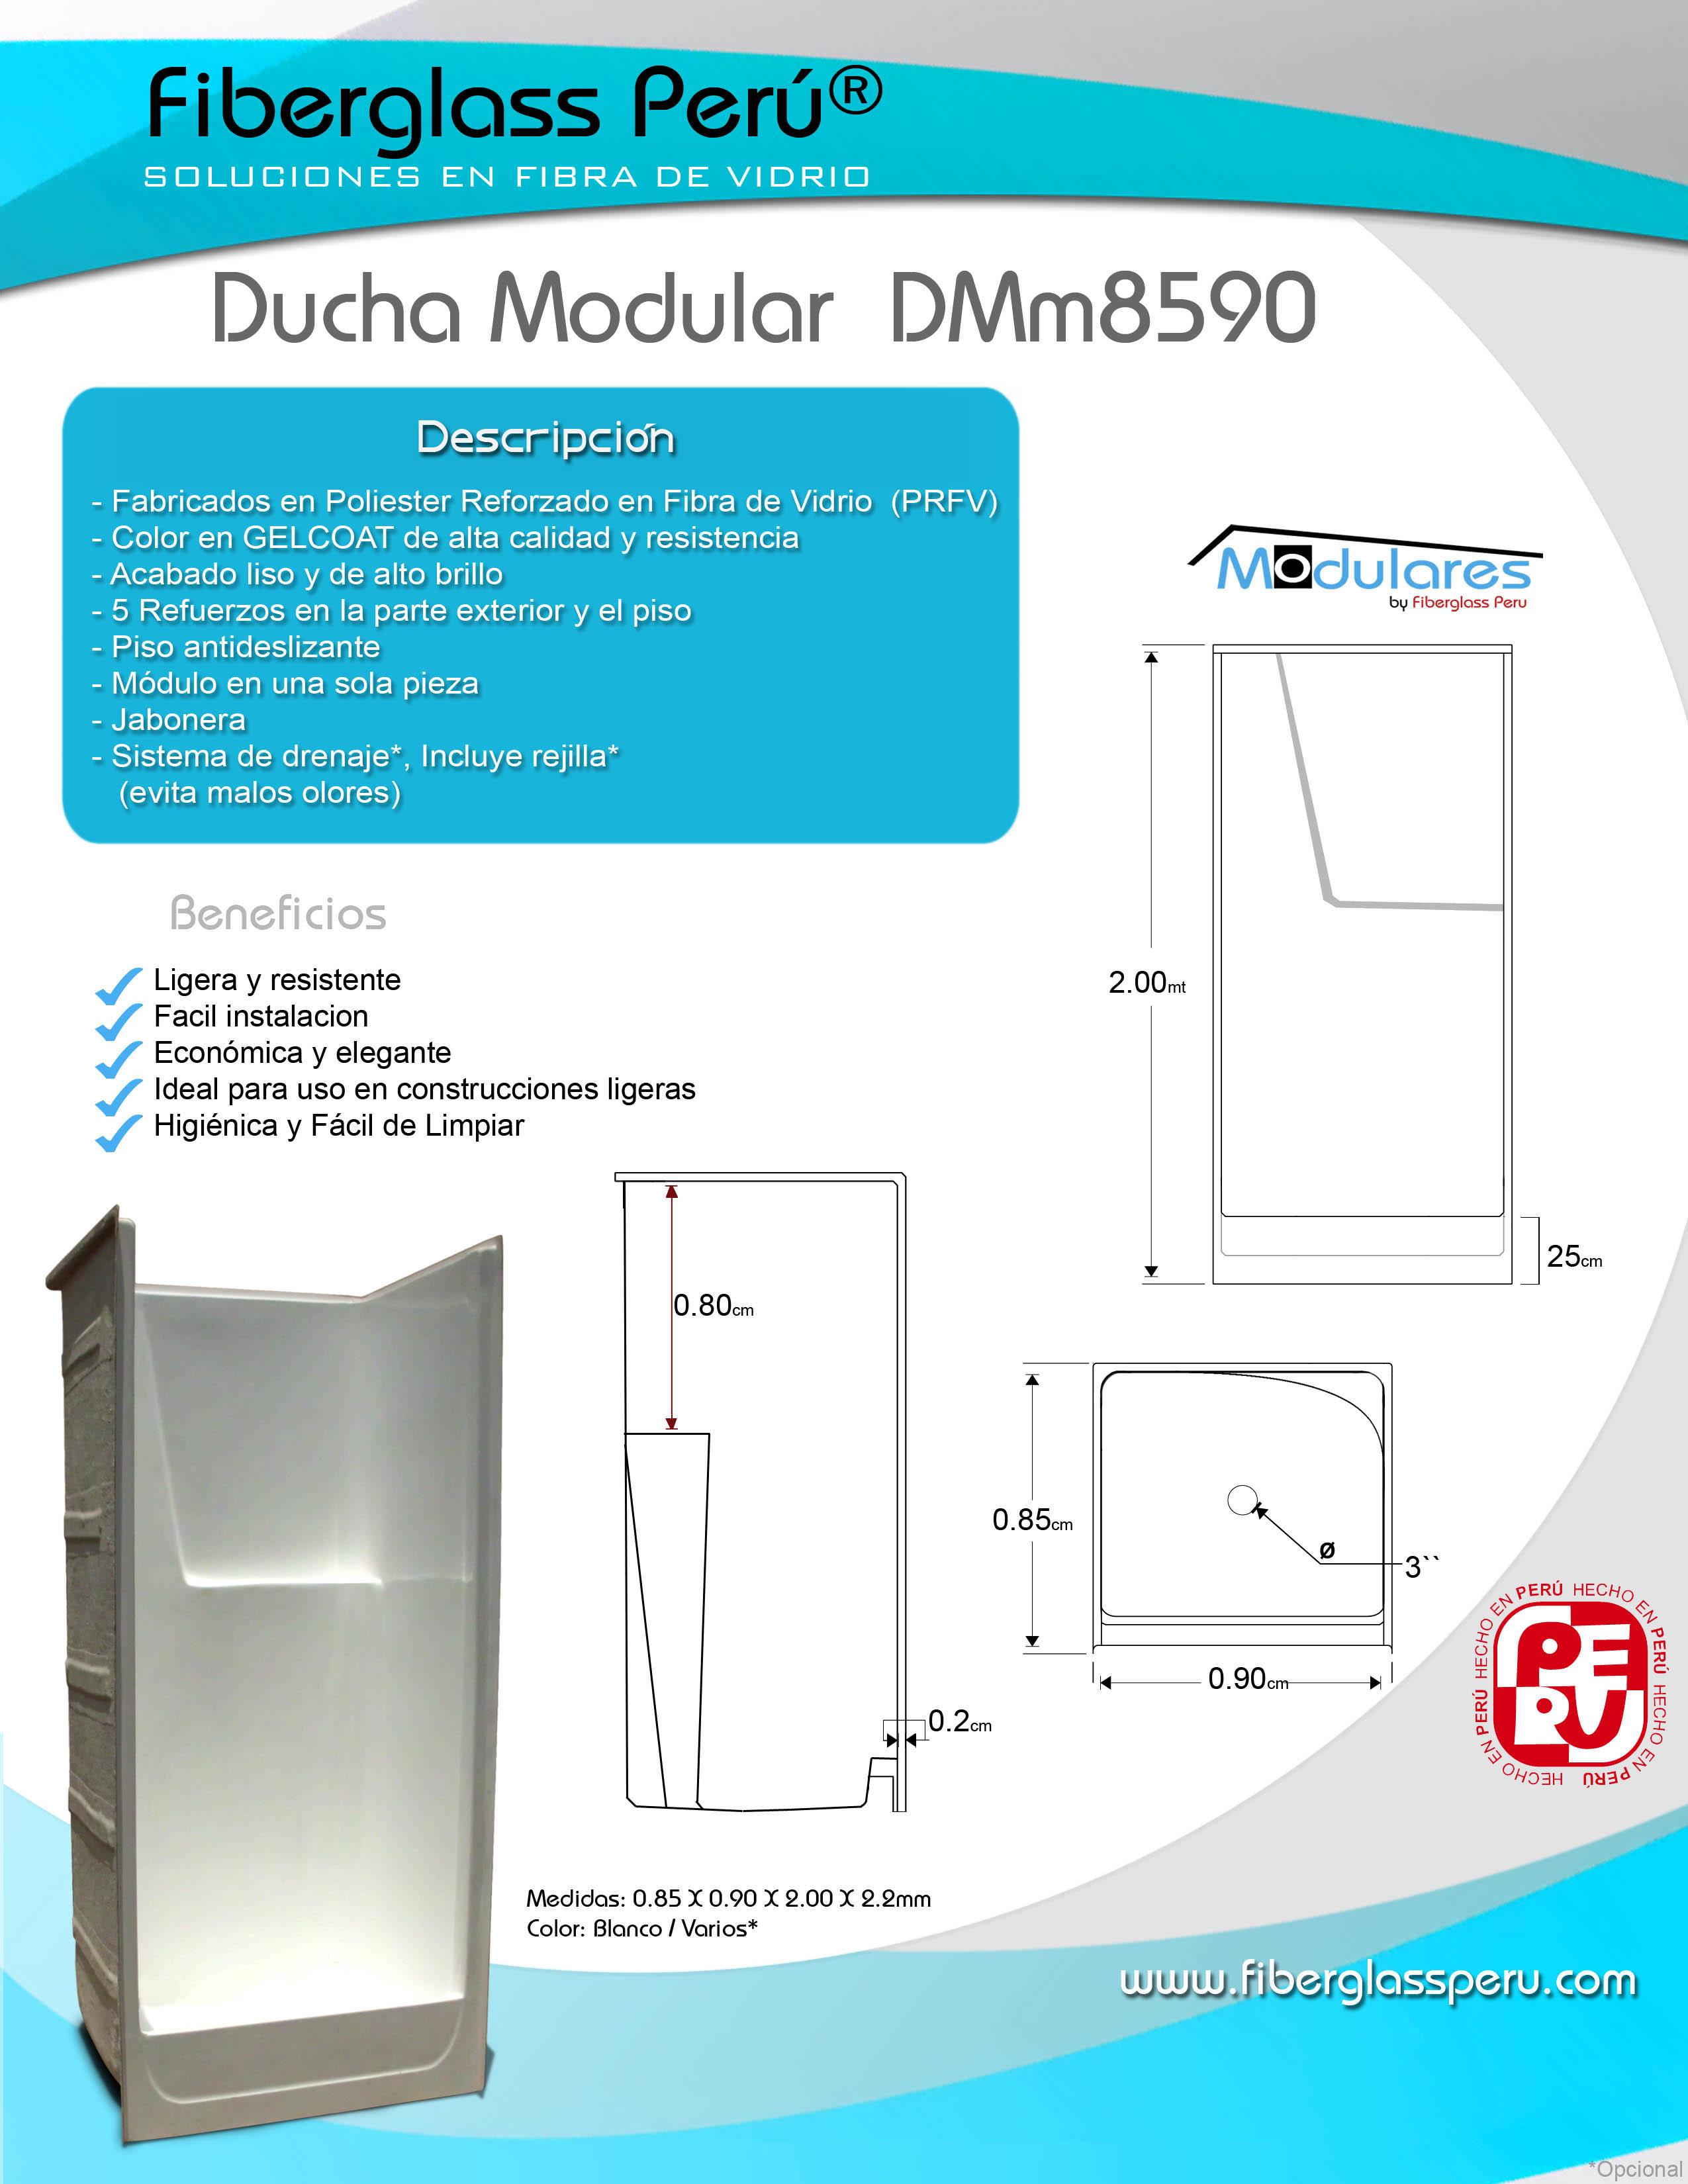 ducha  modular dmm8590.jpg